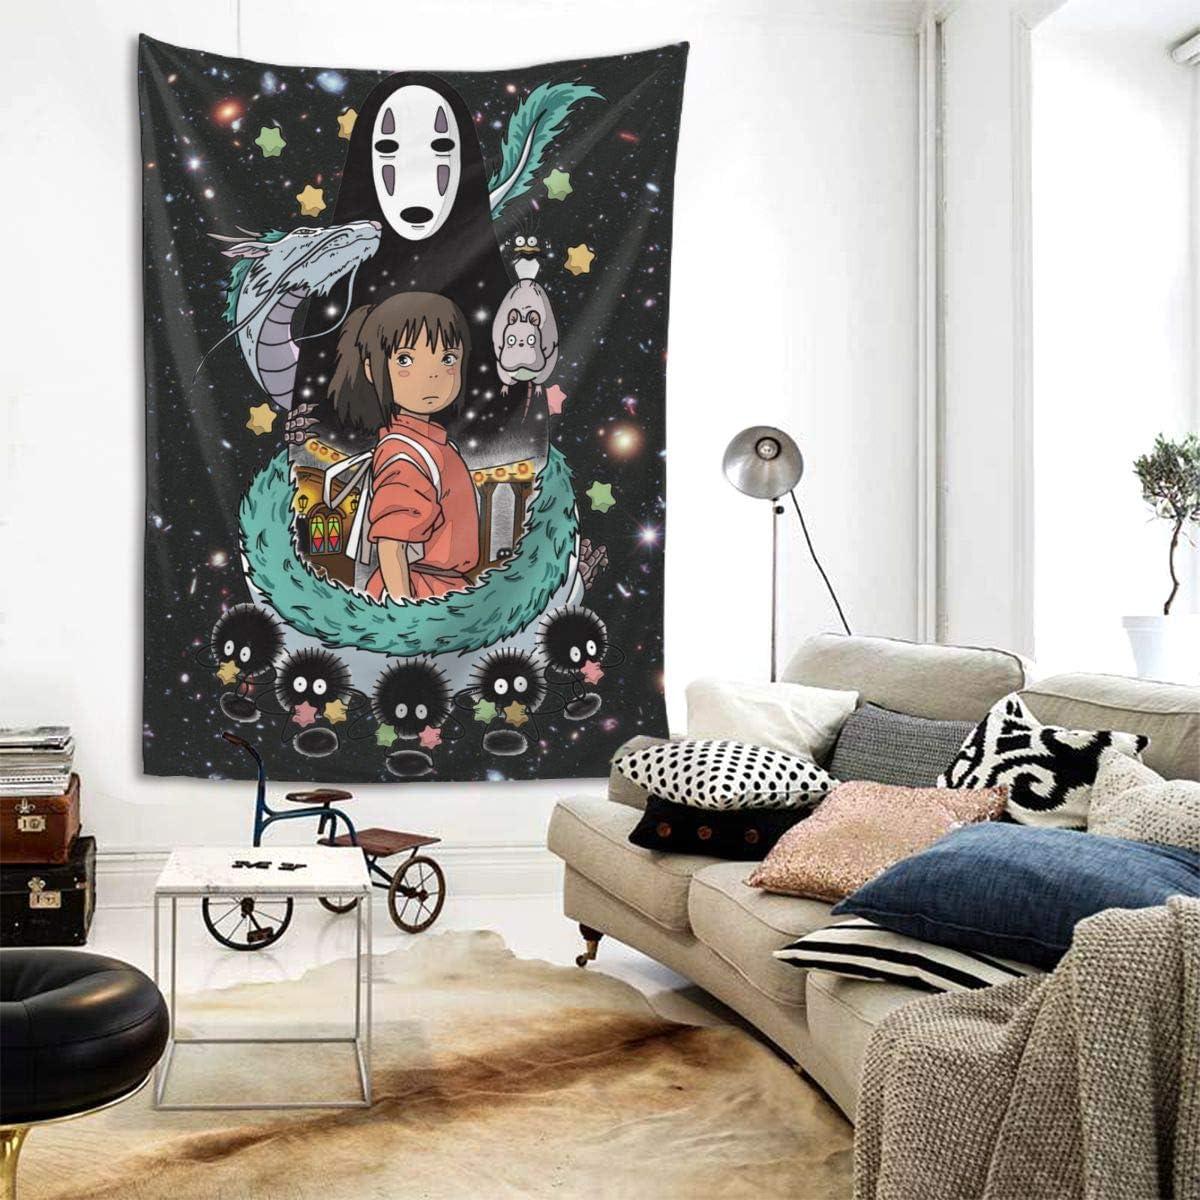 Boniuniu Spirited Away Art Studio Ghibli Large Home Decoration Tapestry for Room Wall Hanging Mural Bedroom Living Room – 80 x 60